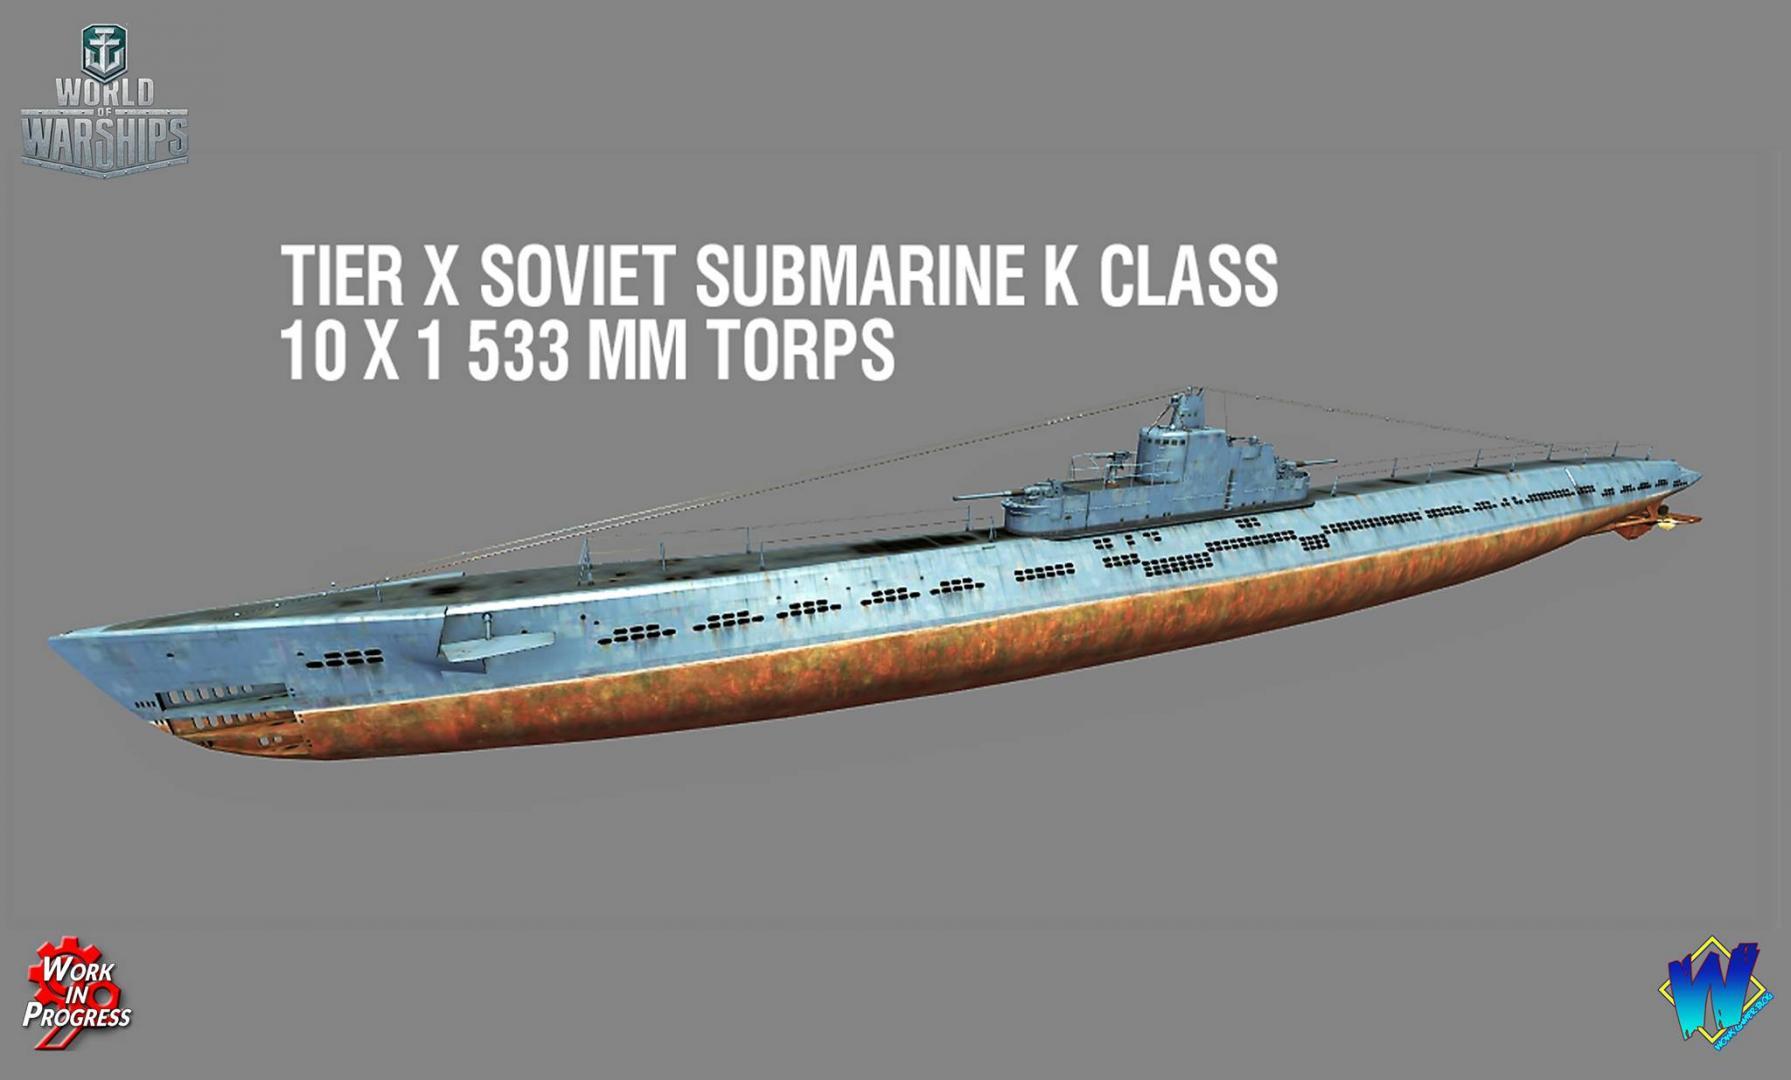 TierX-Sovietsub-Kclass.jpg